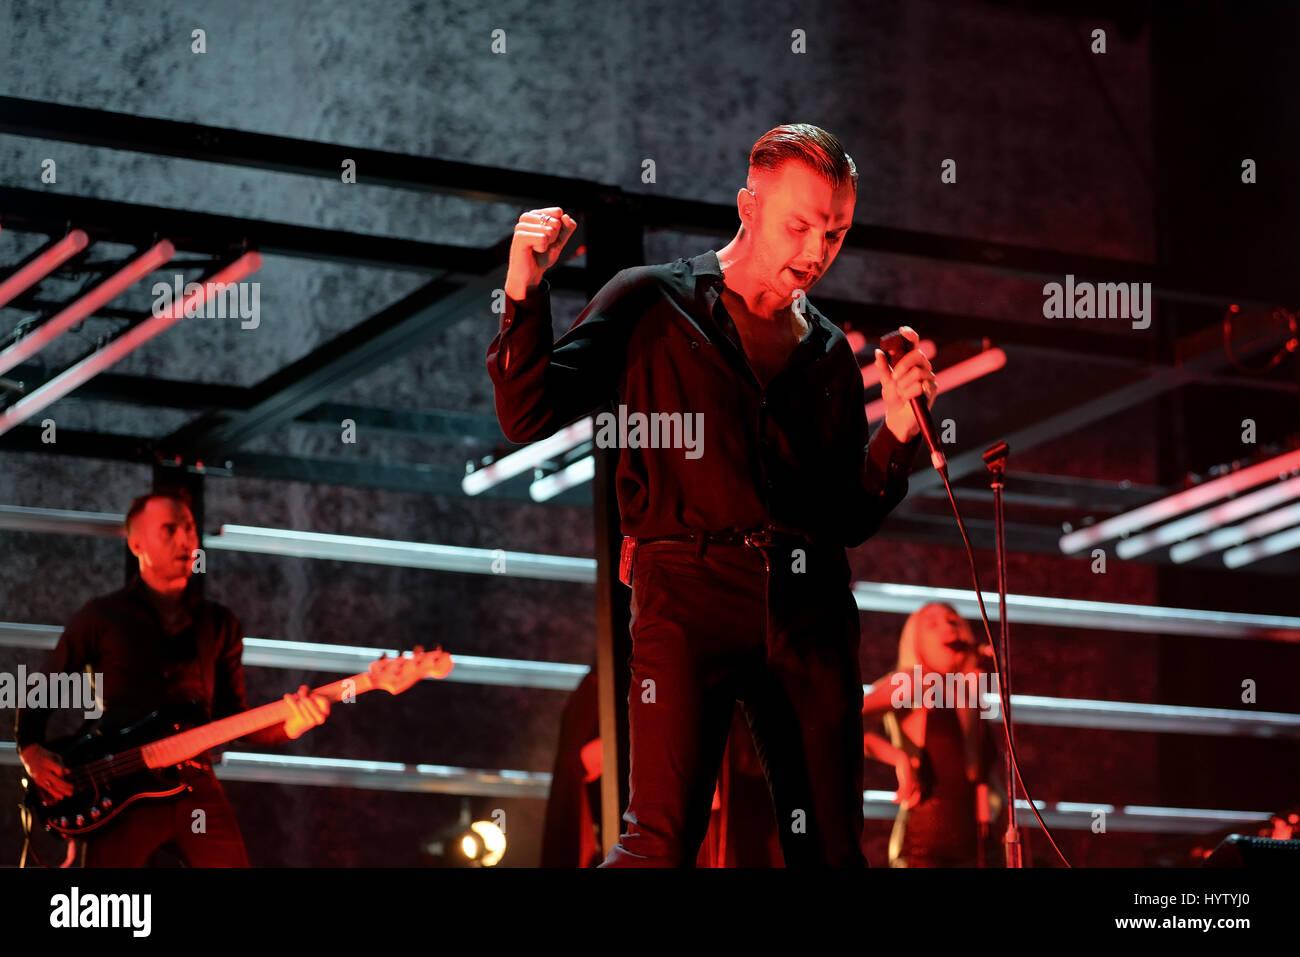 VALENCIA, Spanien - JUN 11: Hurts (Synthpop-Band) führen im Konzert beim Festival de Les Arts am 11. Juni 2016 in Valencia, Spanien. Stockfoto